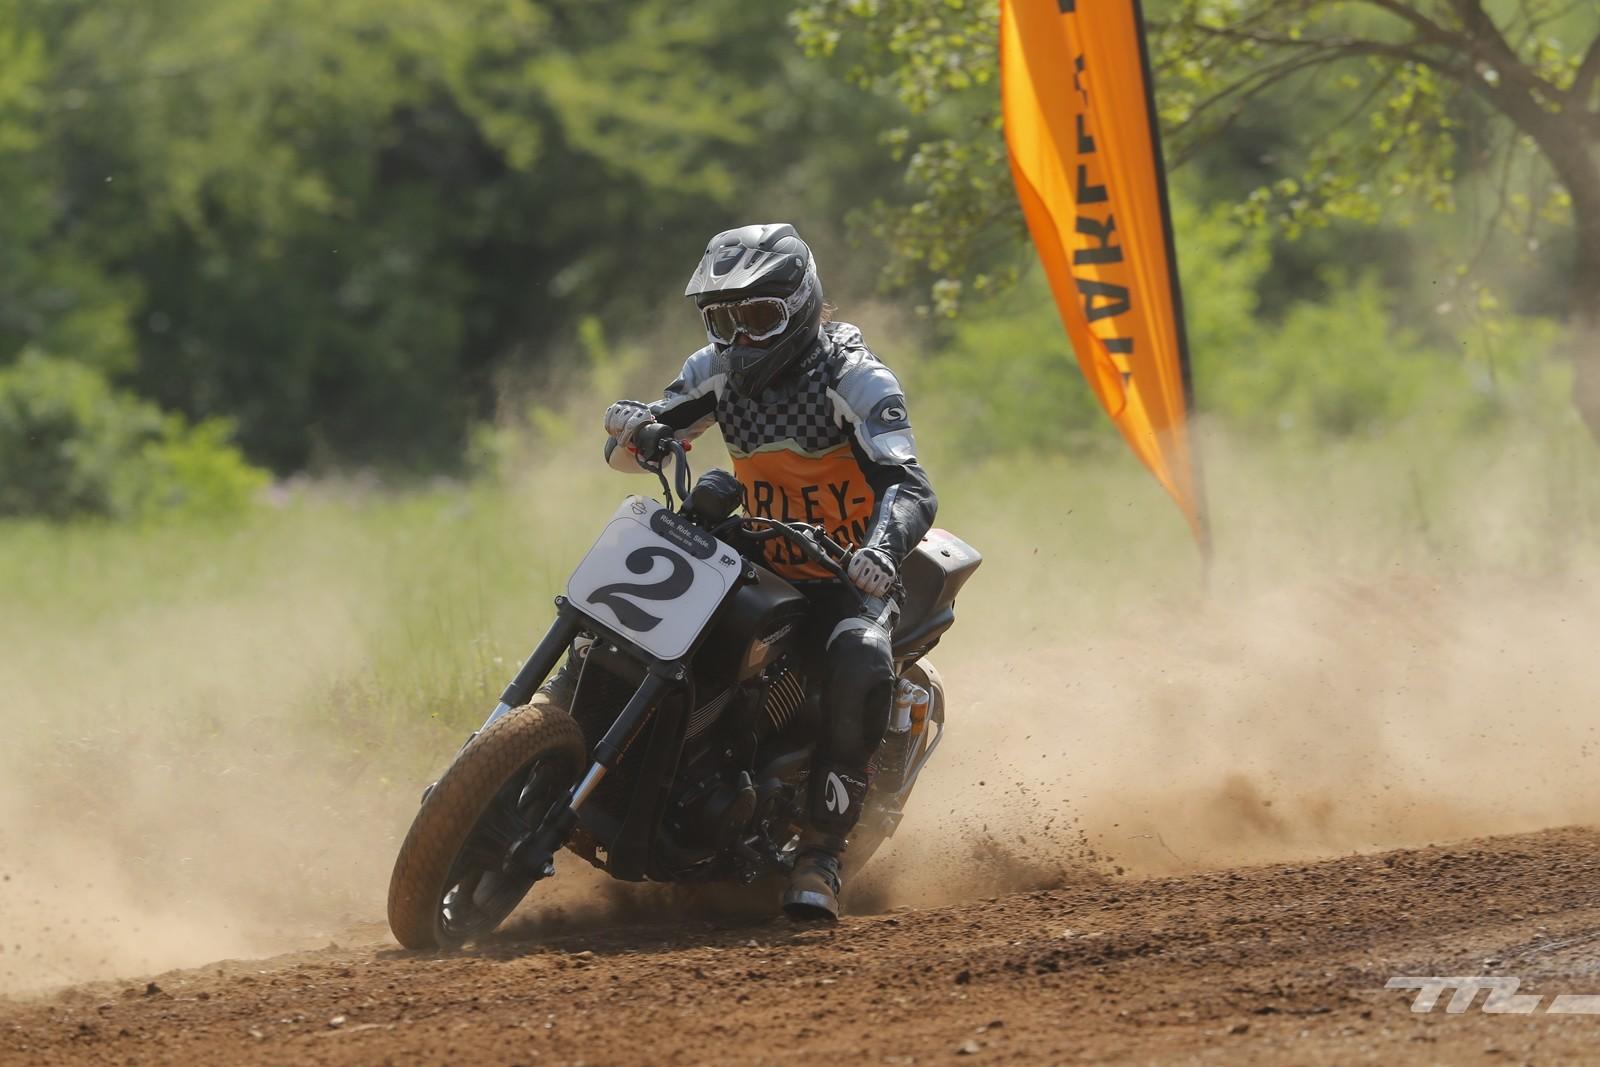 Foto de Harley-Davidson Ride Ride Slide 2018 (23/82)